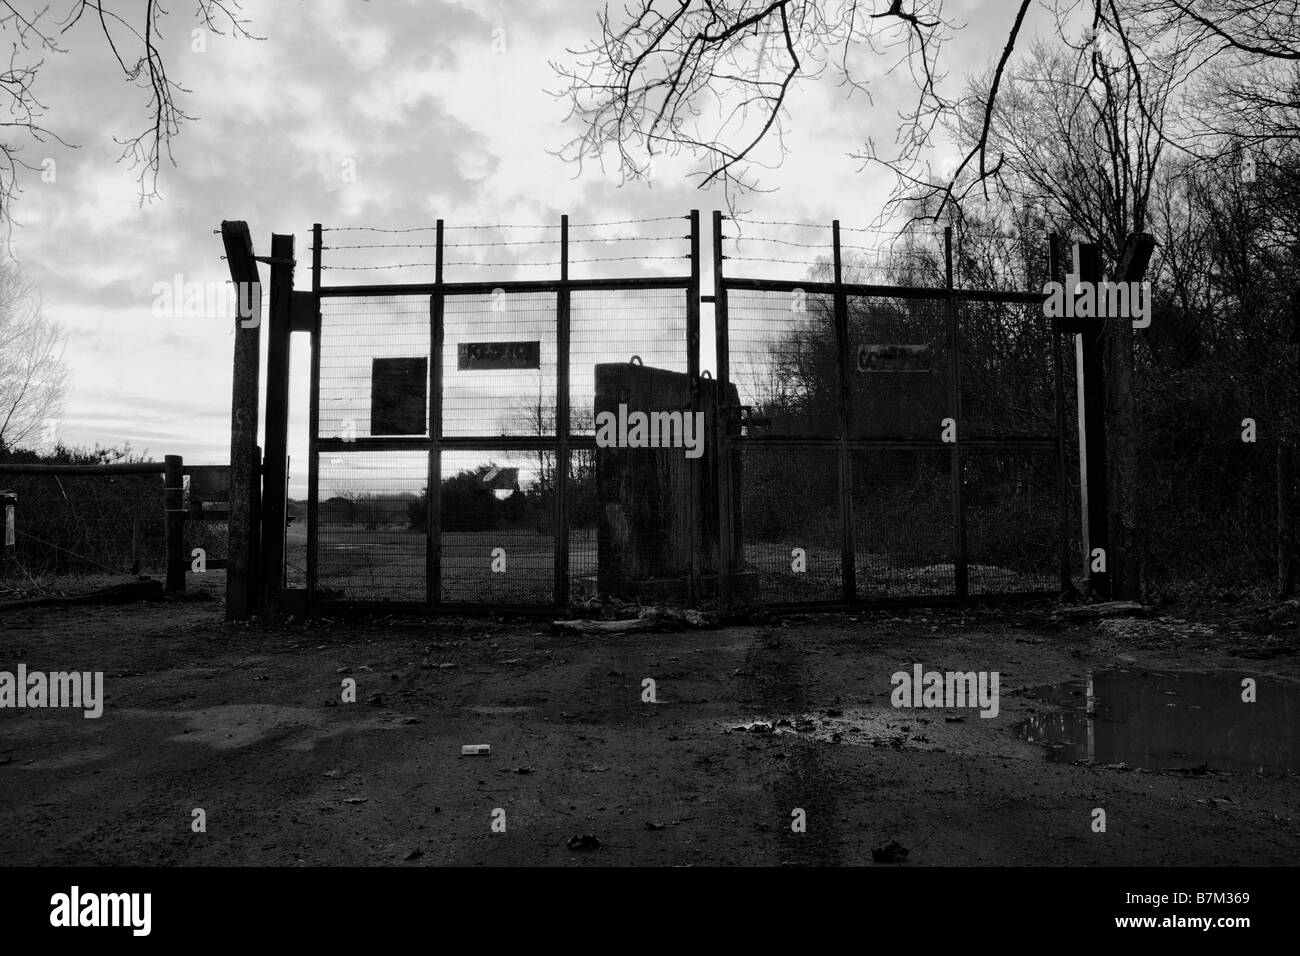 Banque Burys Gate Photo Stock